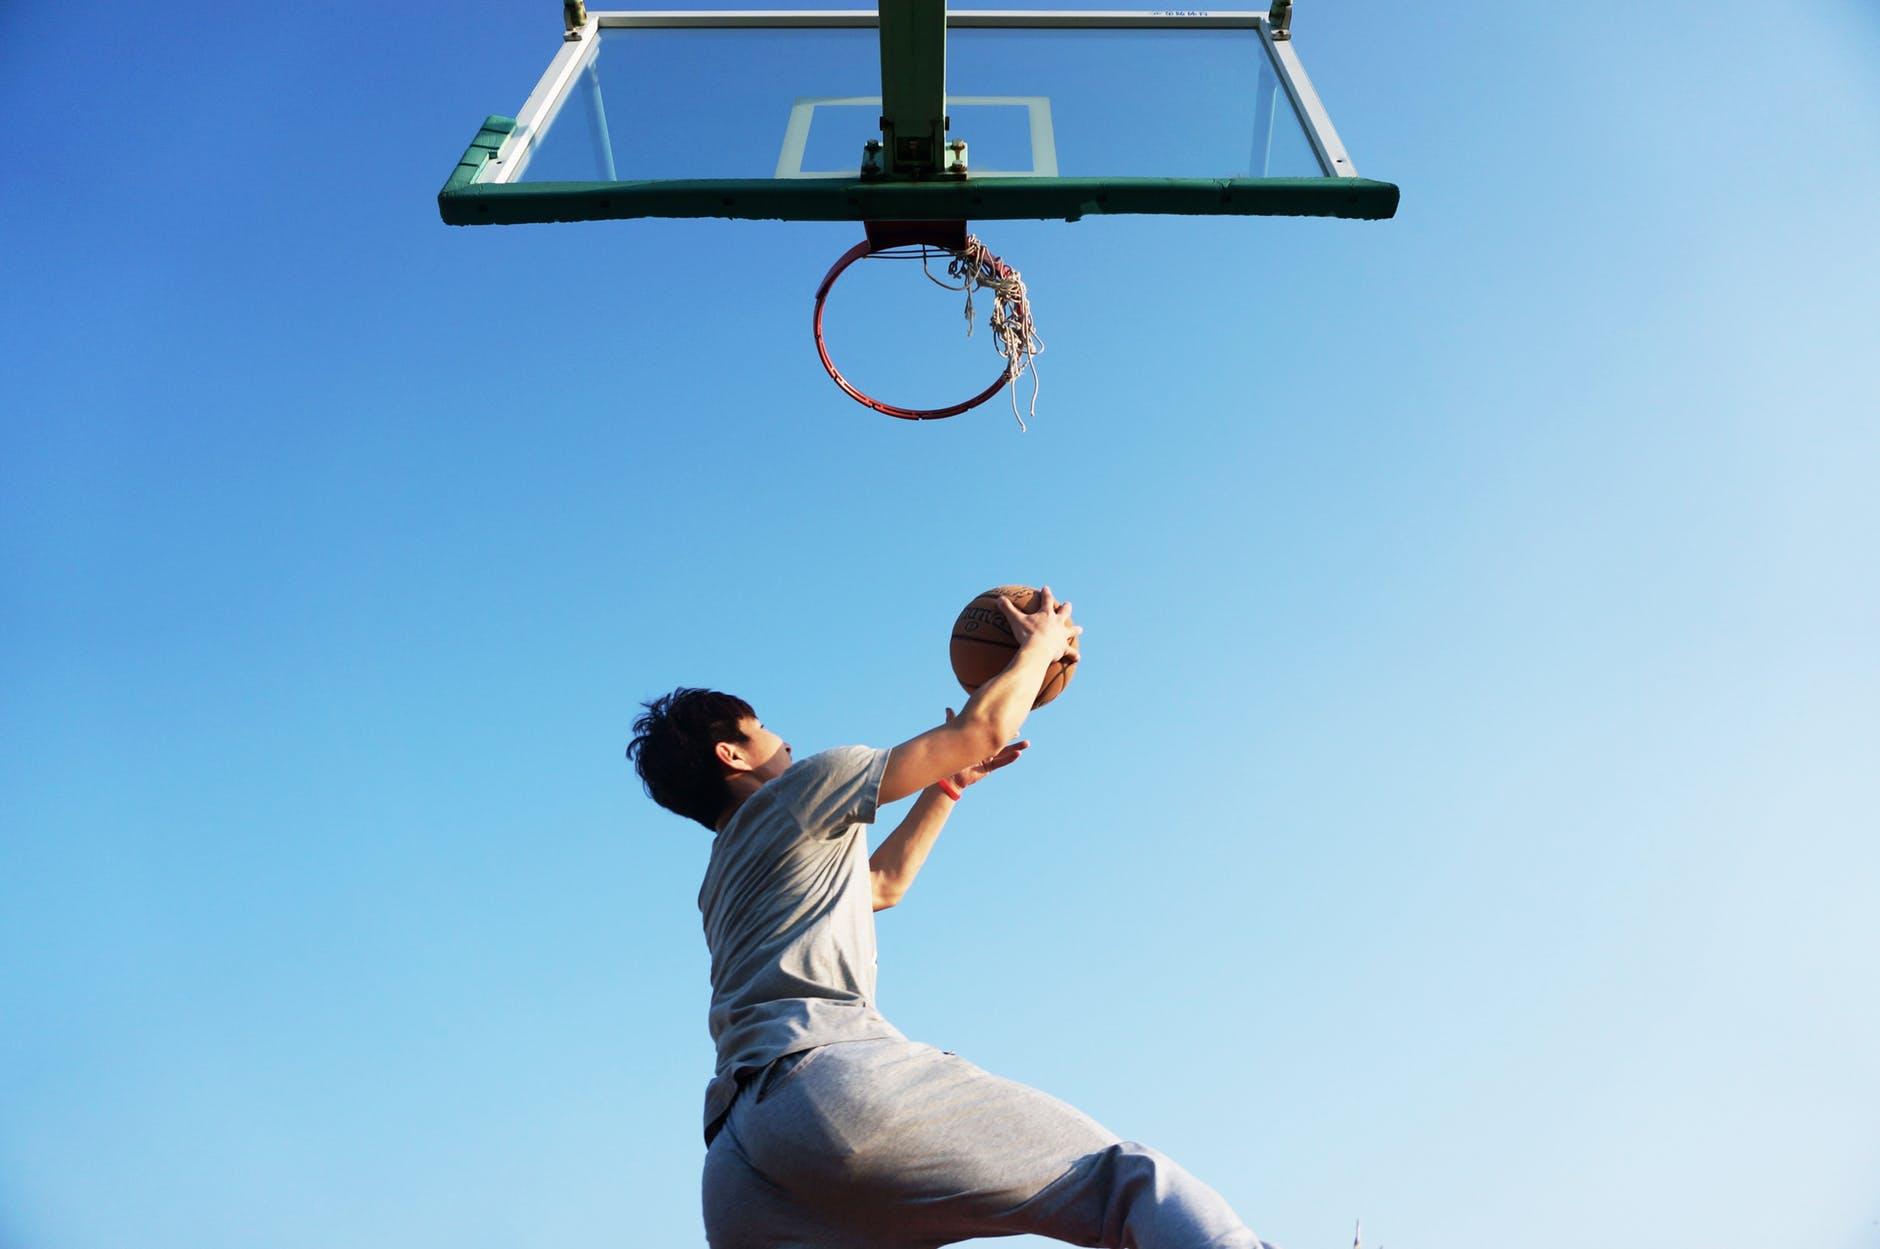 basketball-dunk-blue-game-163452.jpg